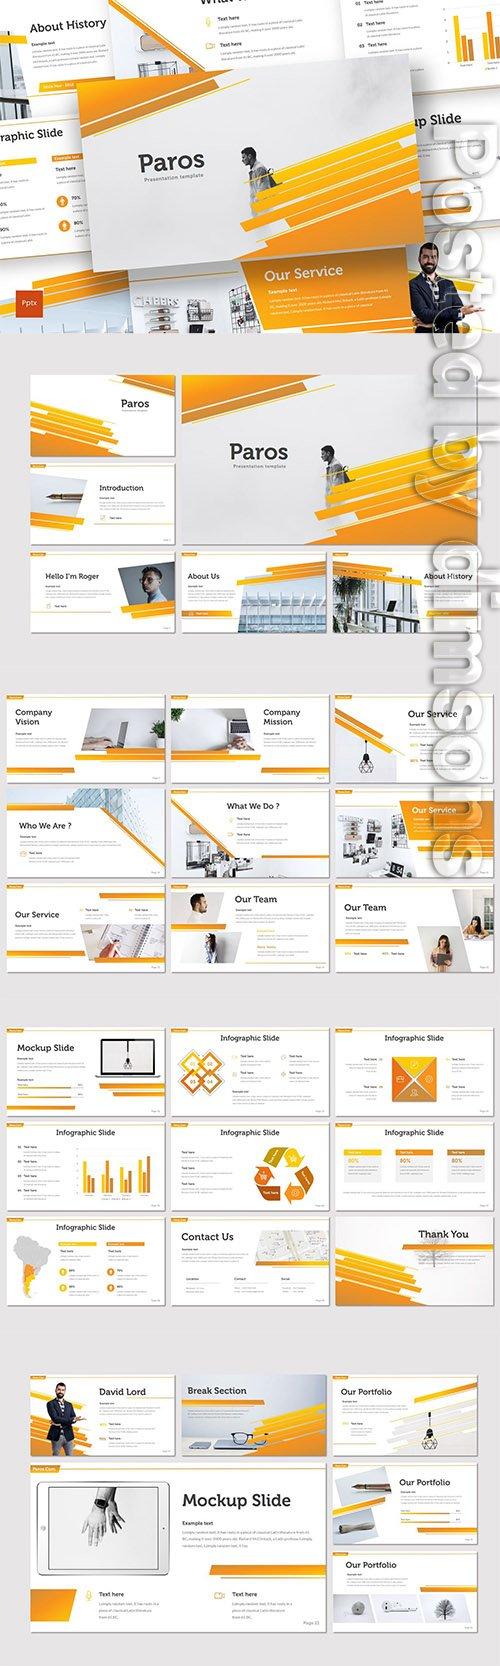 Paros - Powerpoint, Keynote and Google Slides Templates